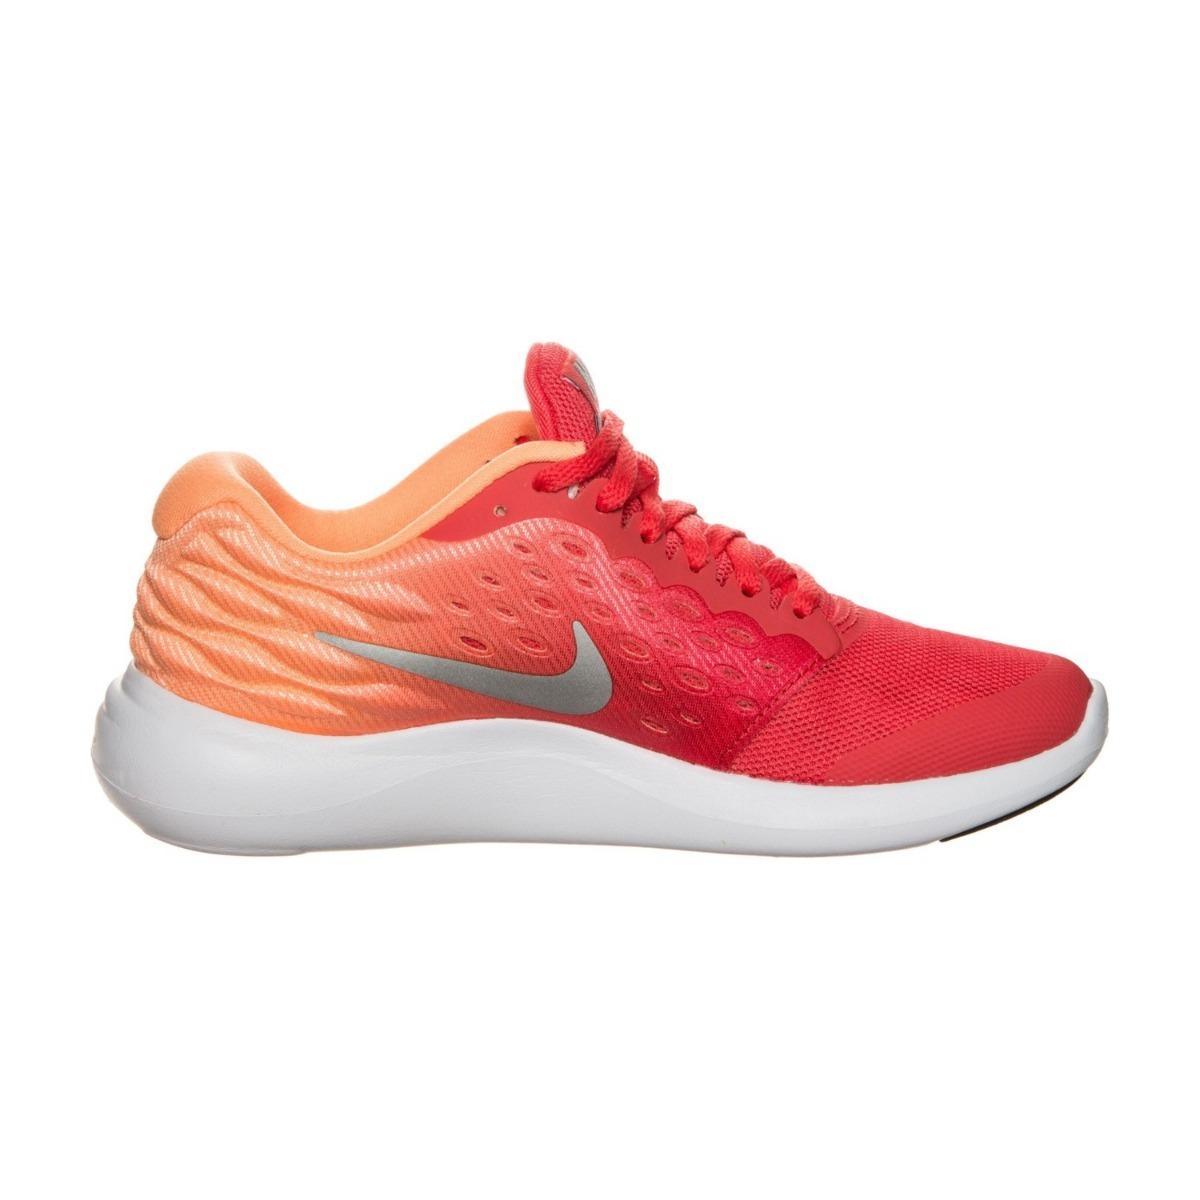 22c38a9c2d941 ... sale tenis nike lunarstelos naranja dama 844974 800. cargando zoom.  e2428 7e335